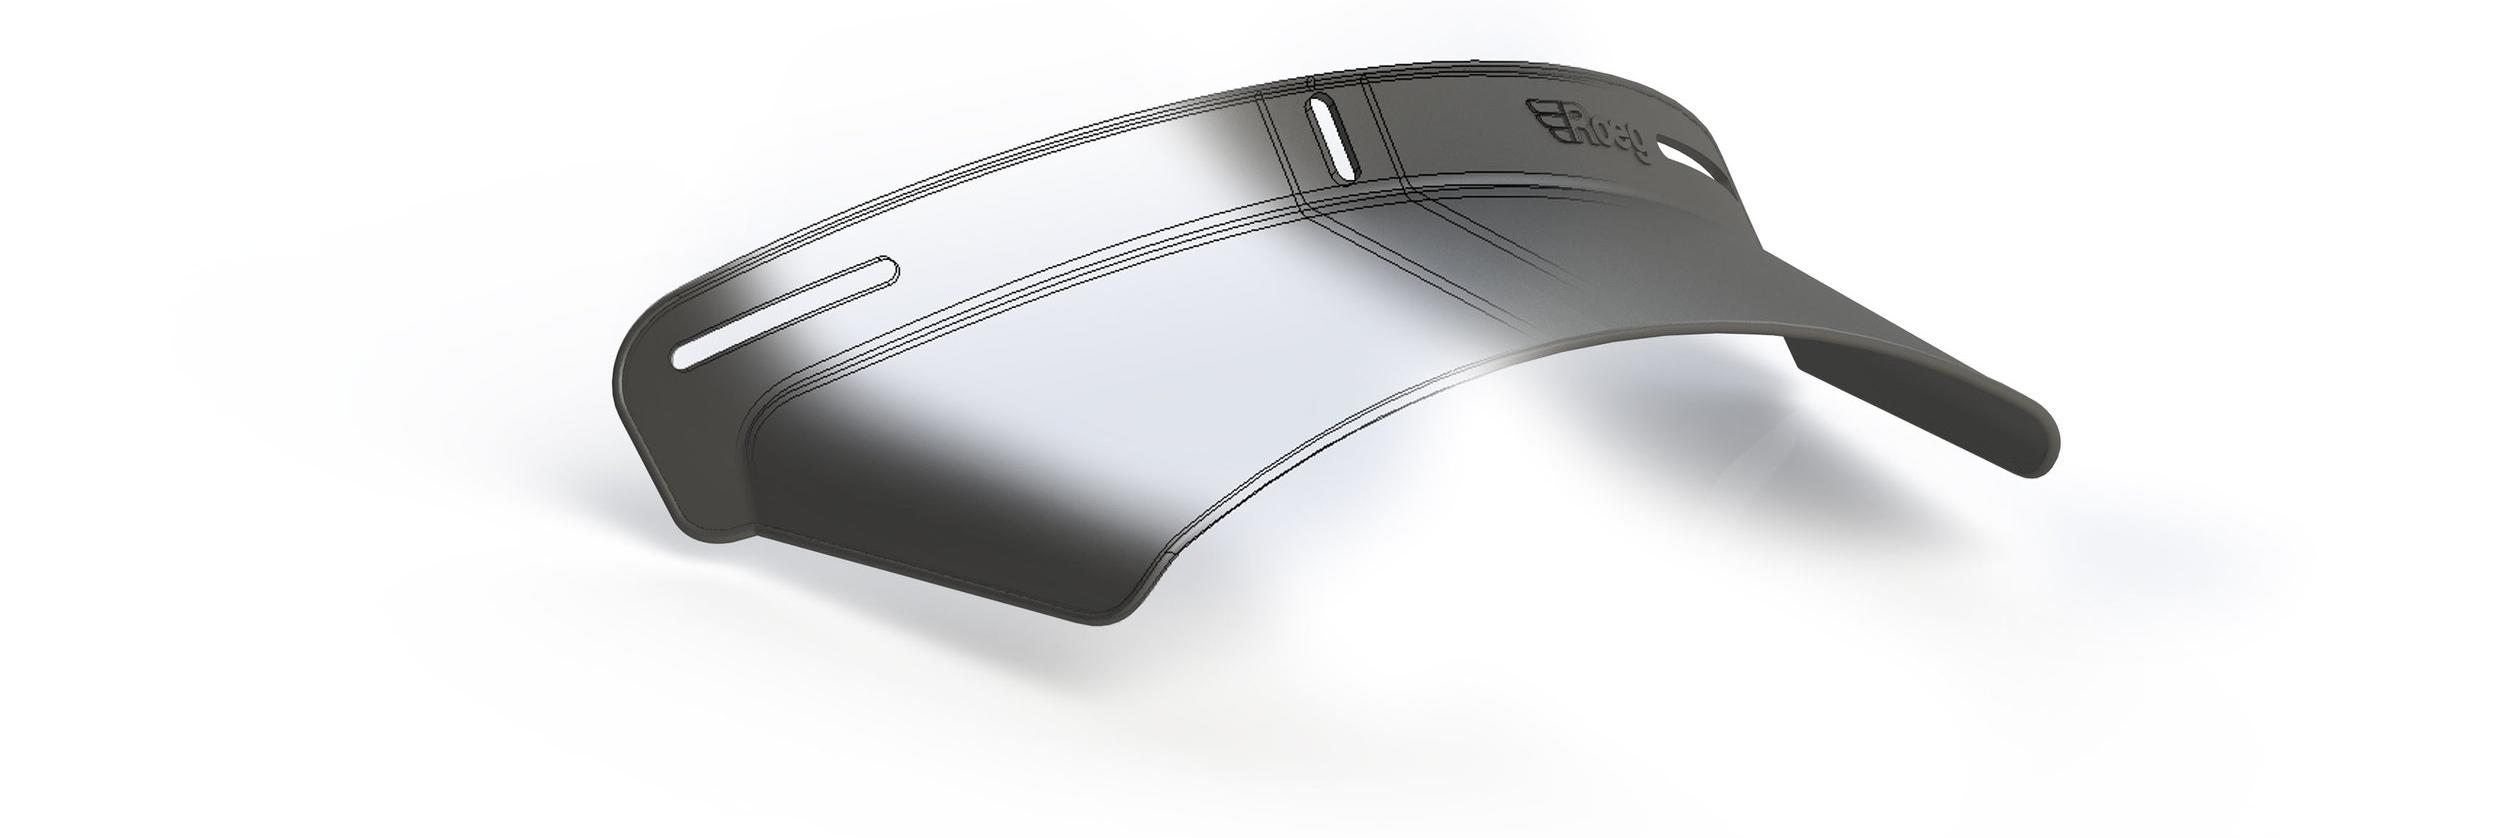 3D model of peak for the Peruna Helmet modeled in Solidworks